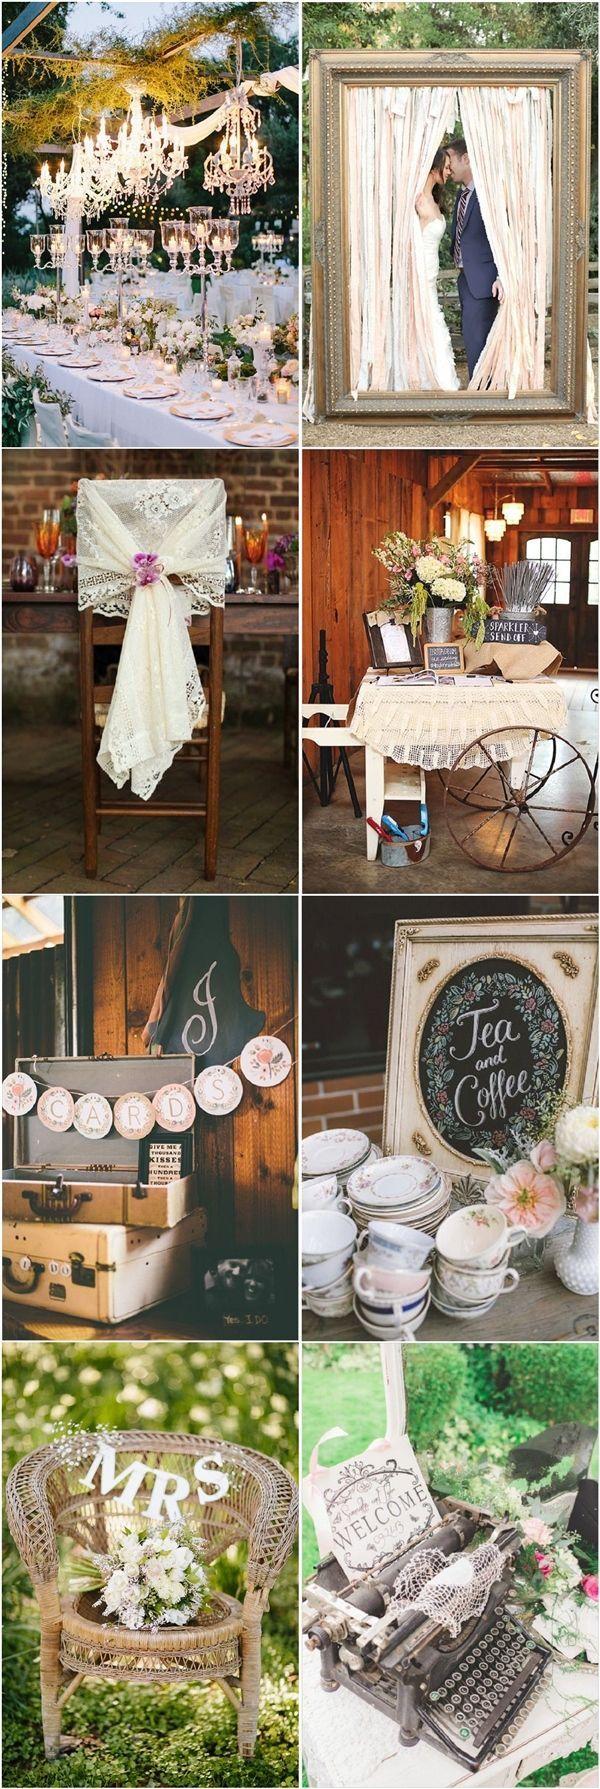 chic vintage wedding decor ideas